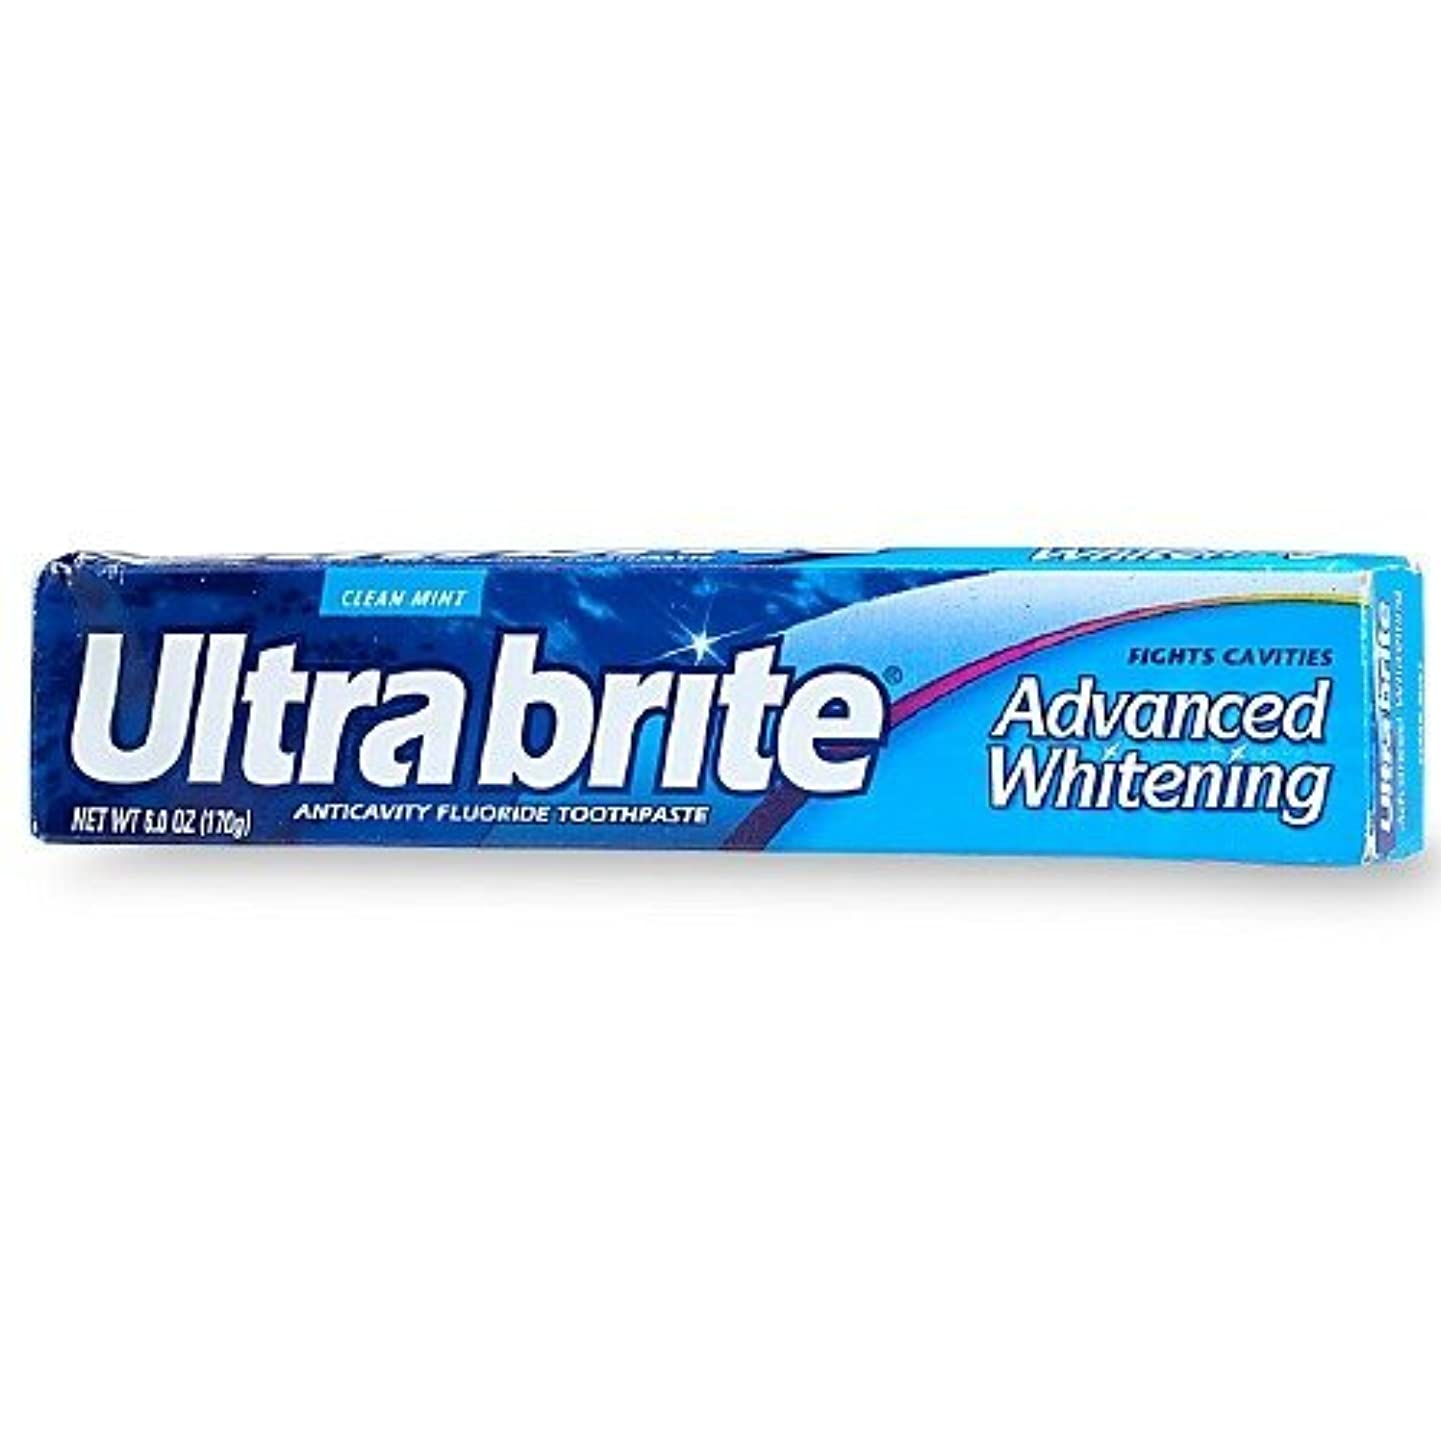 居間桁残酷な海外直送品Colgate Colgate Ultra Brite Advanced Whitening Fluoride Toothpaste, 6 oz (Pack of 3)